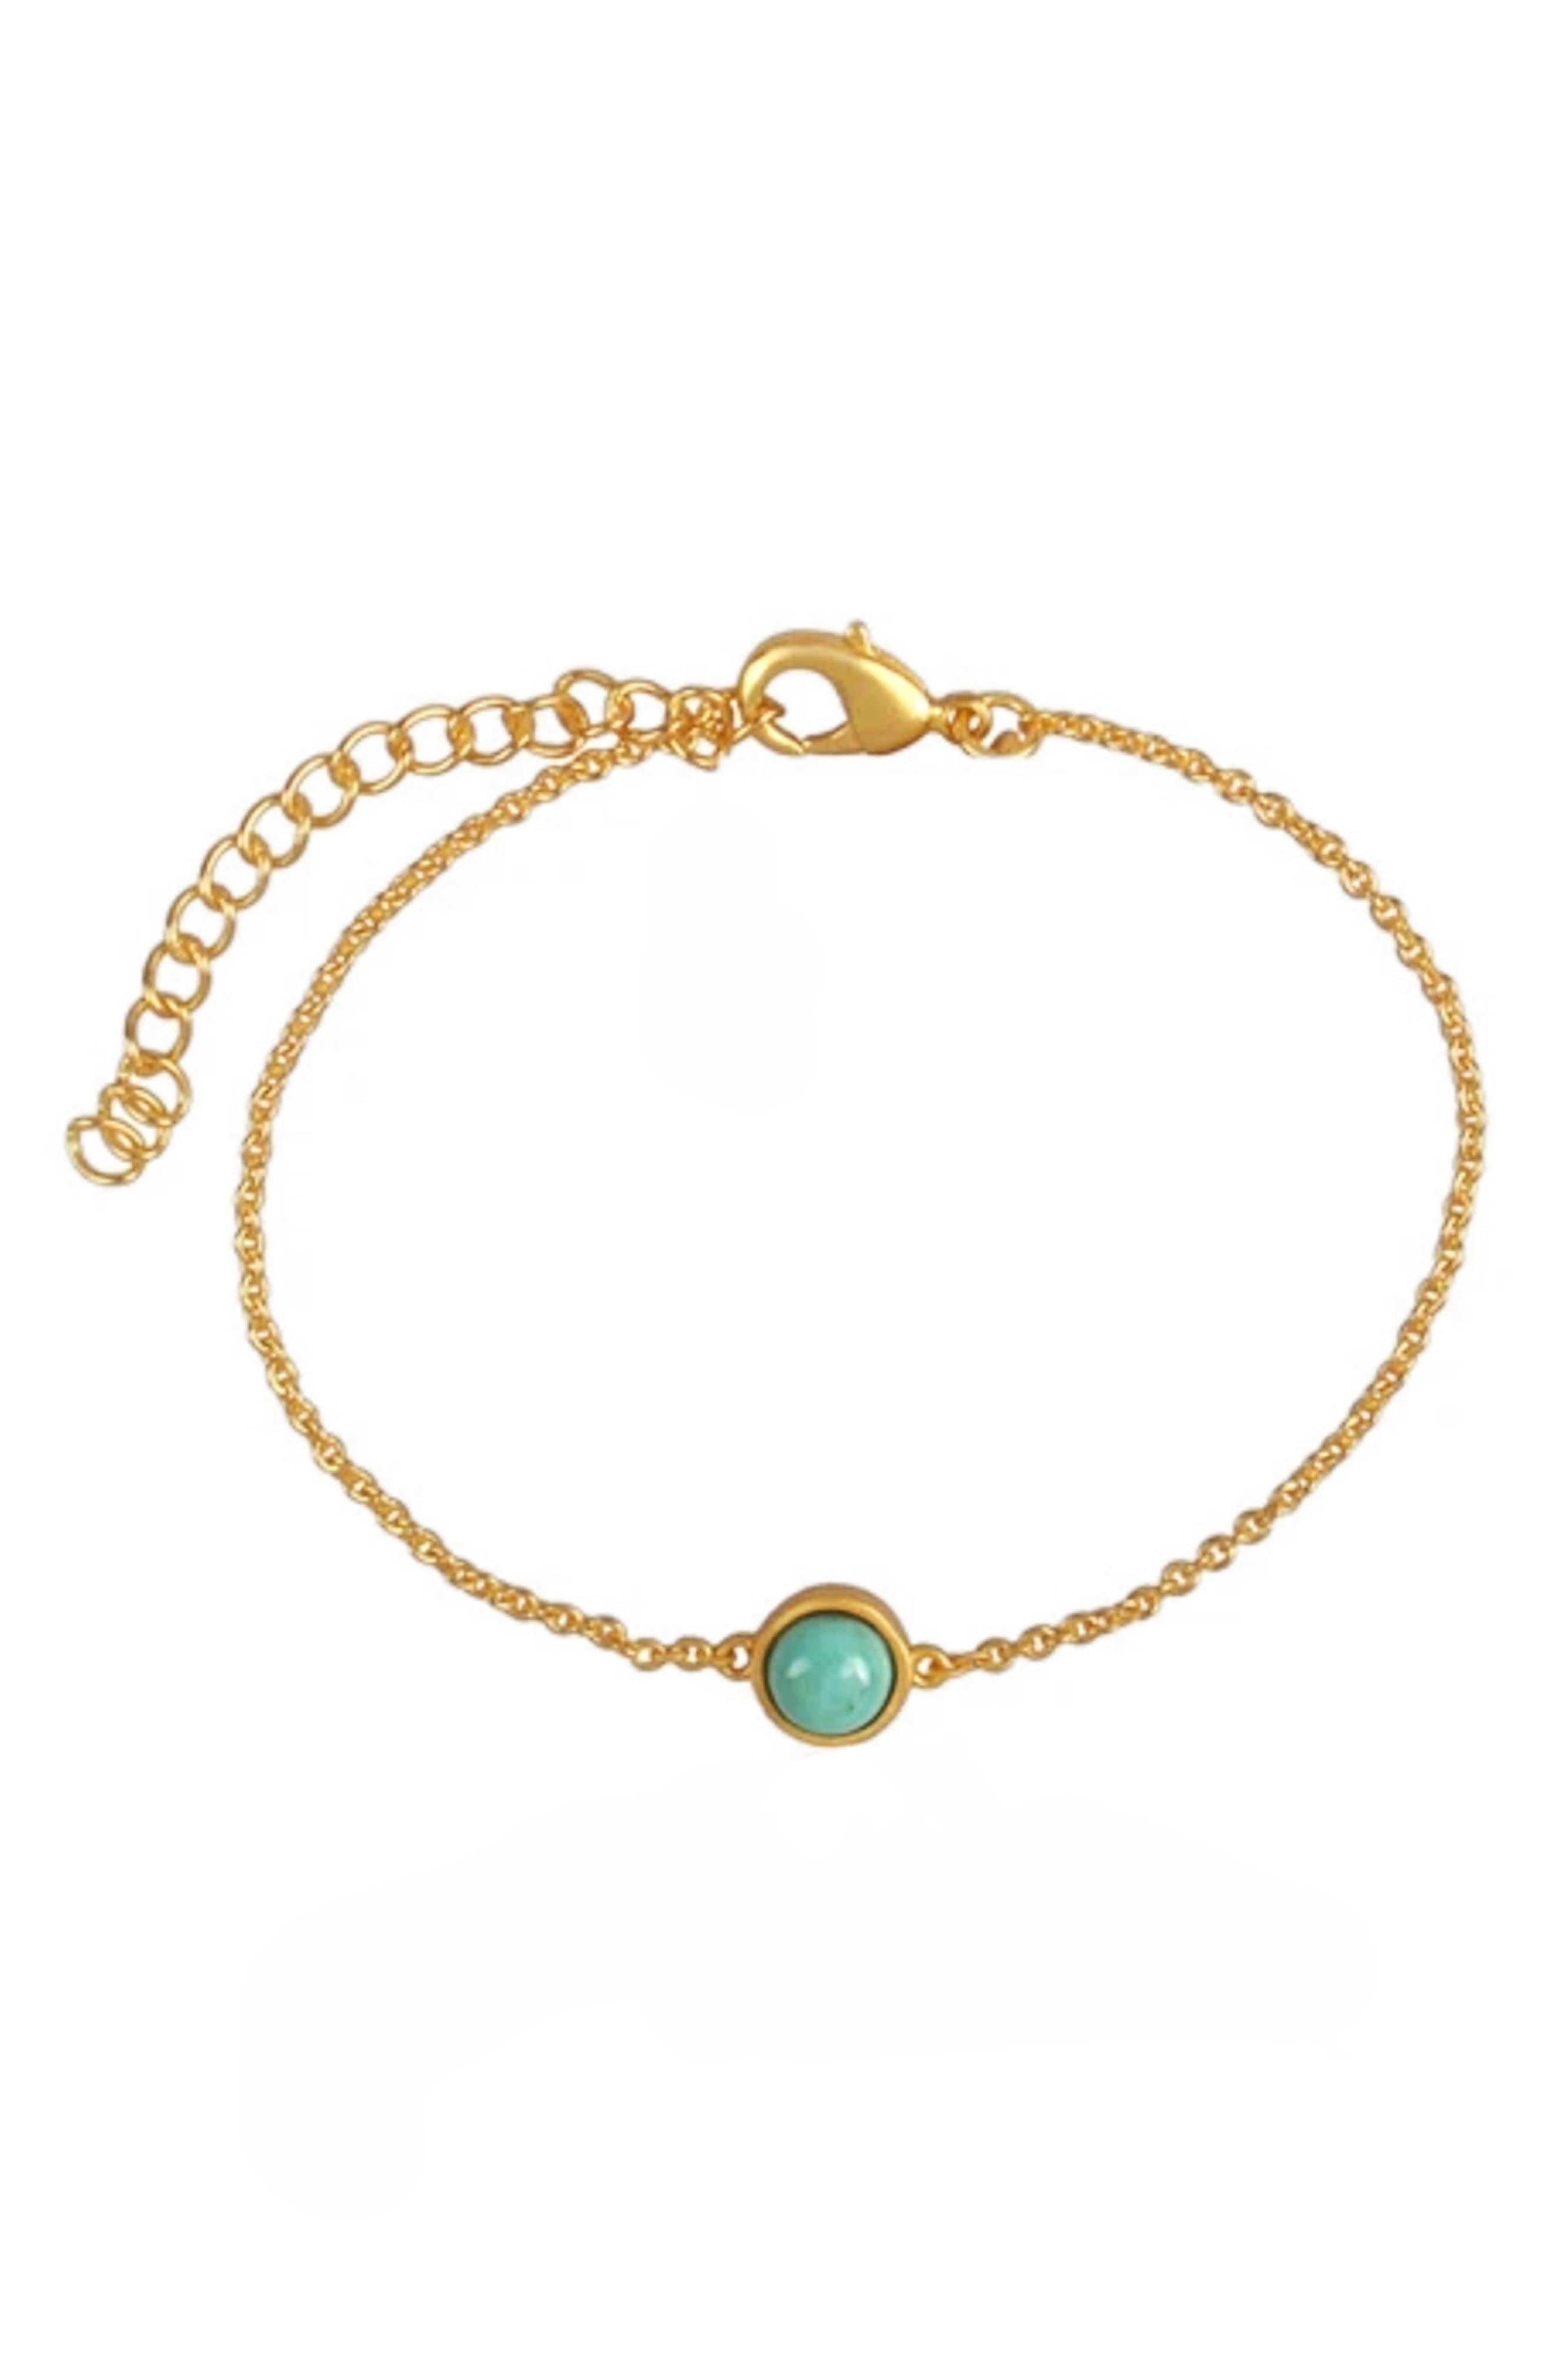 Dainty Turquoise Pendant Bracelet